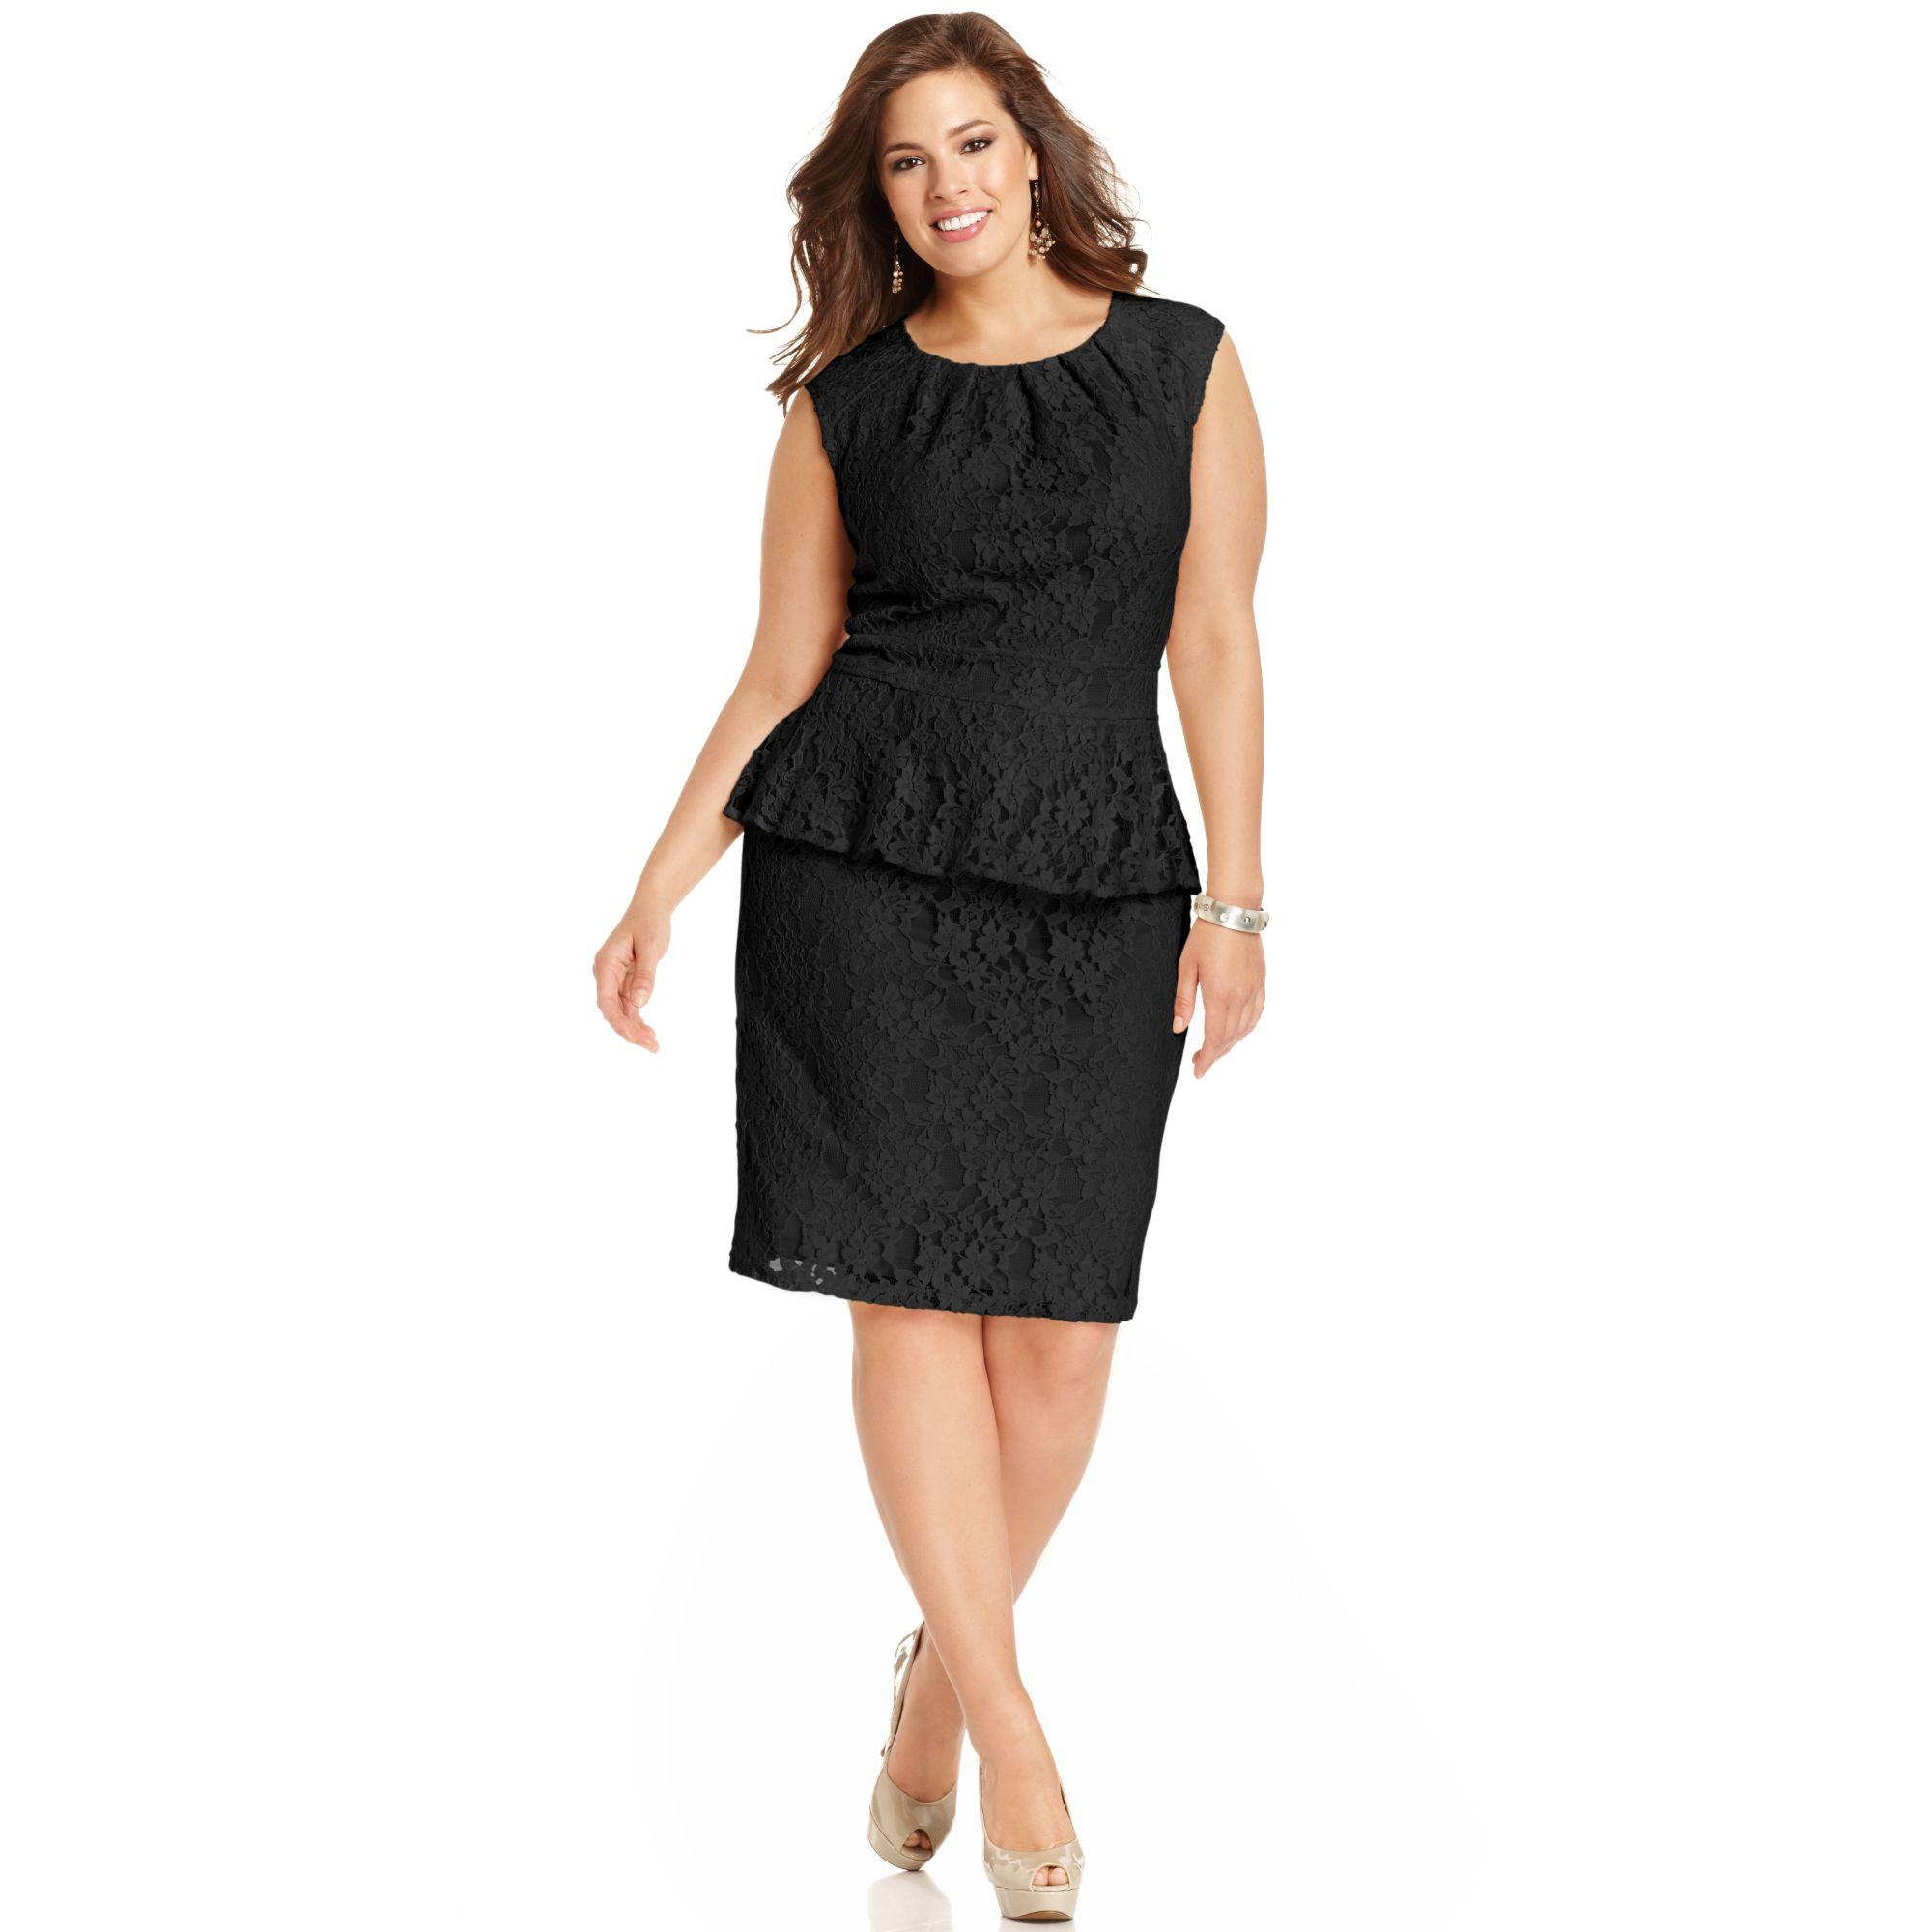 Plus Size Capsleeve Lace Peplum Dress